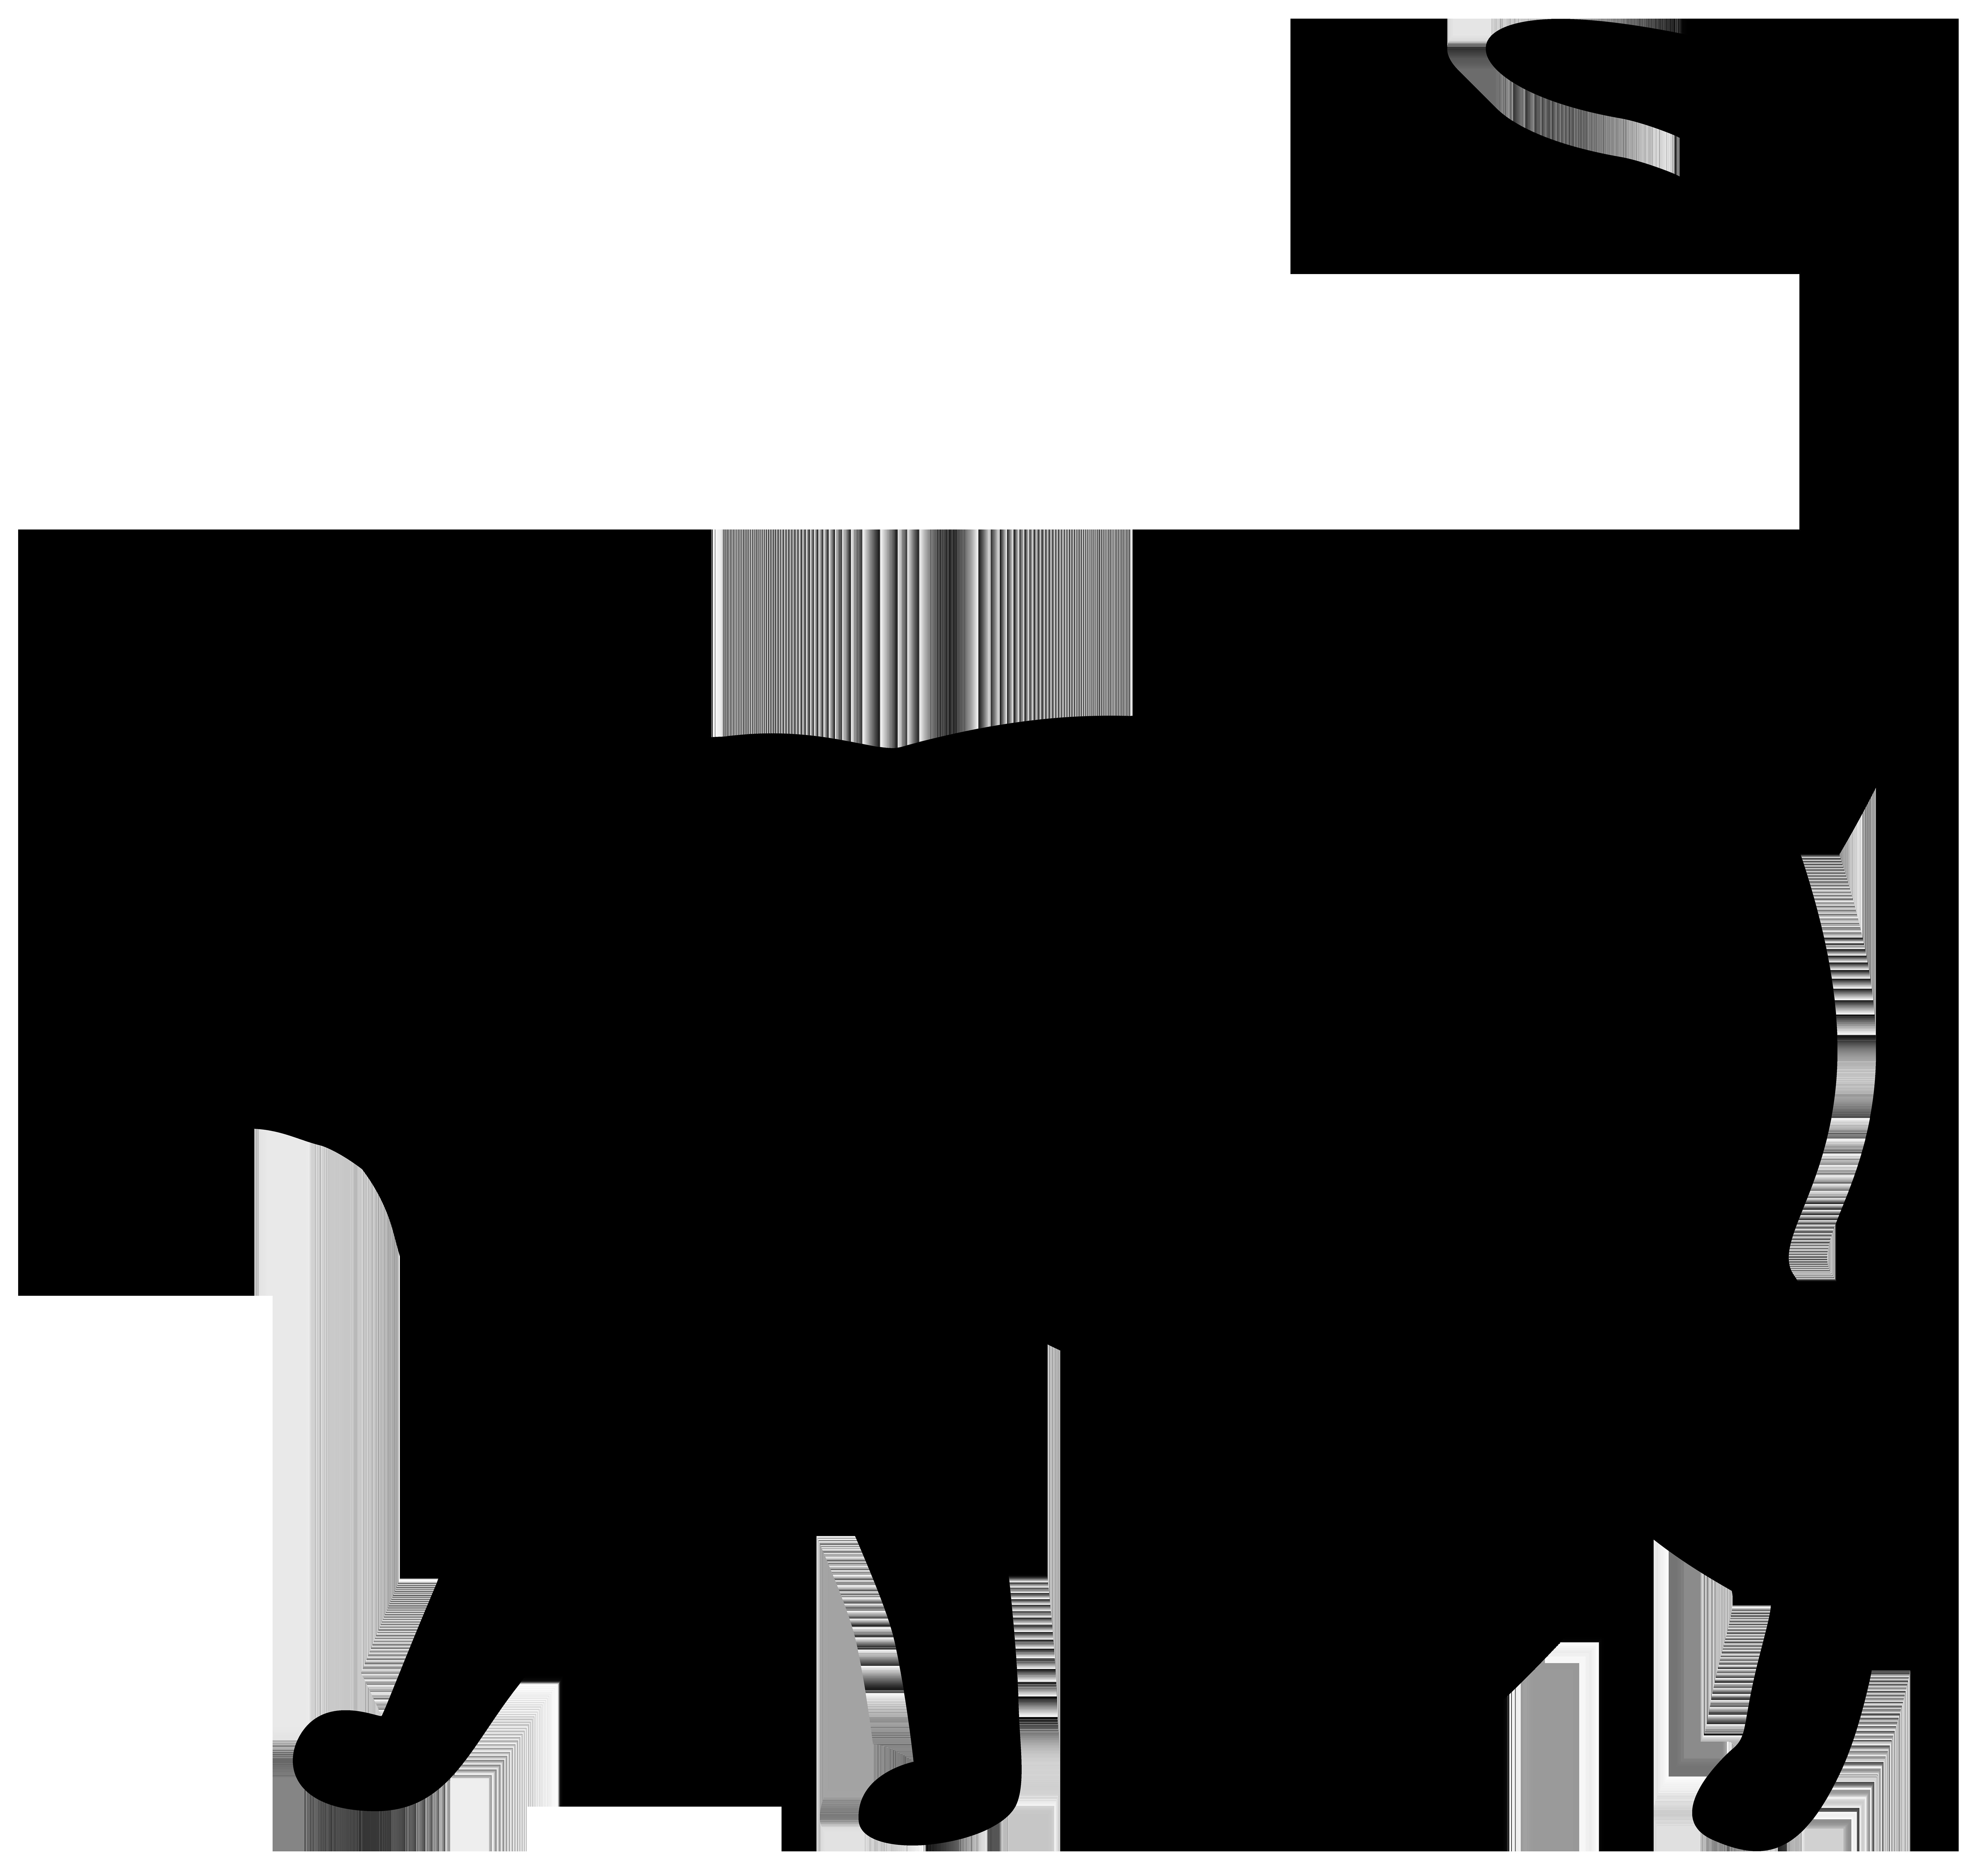 8000x7522 Cat Silhouette Png Transparent Clip Art Imageu200b Gallery